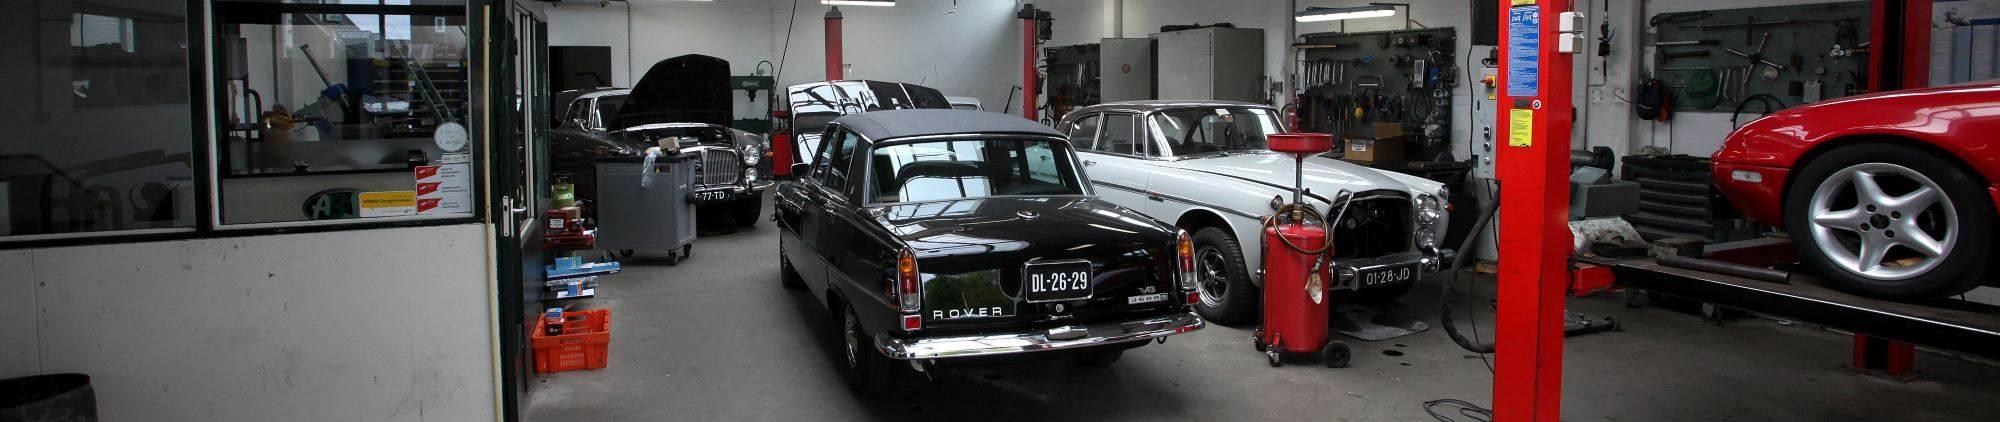 klassieke rover garage